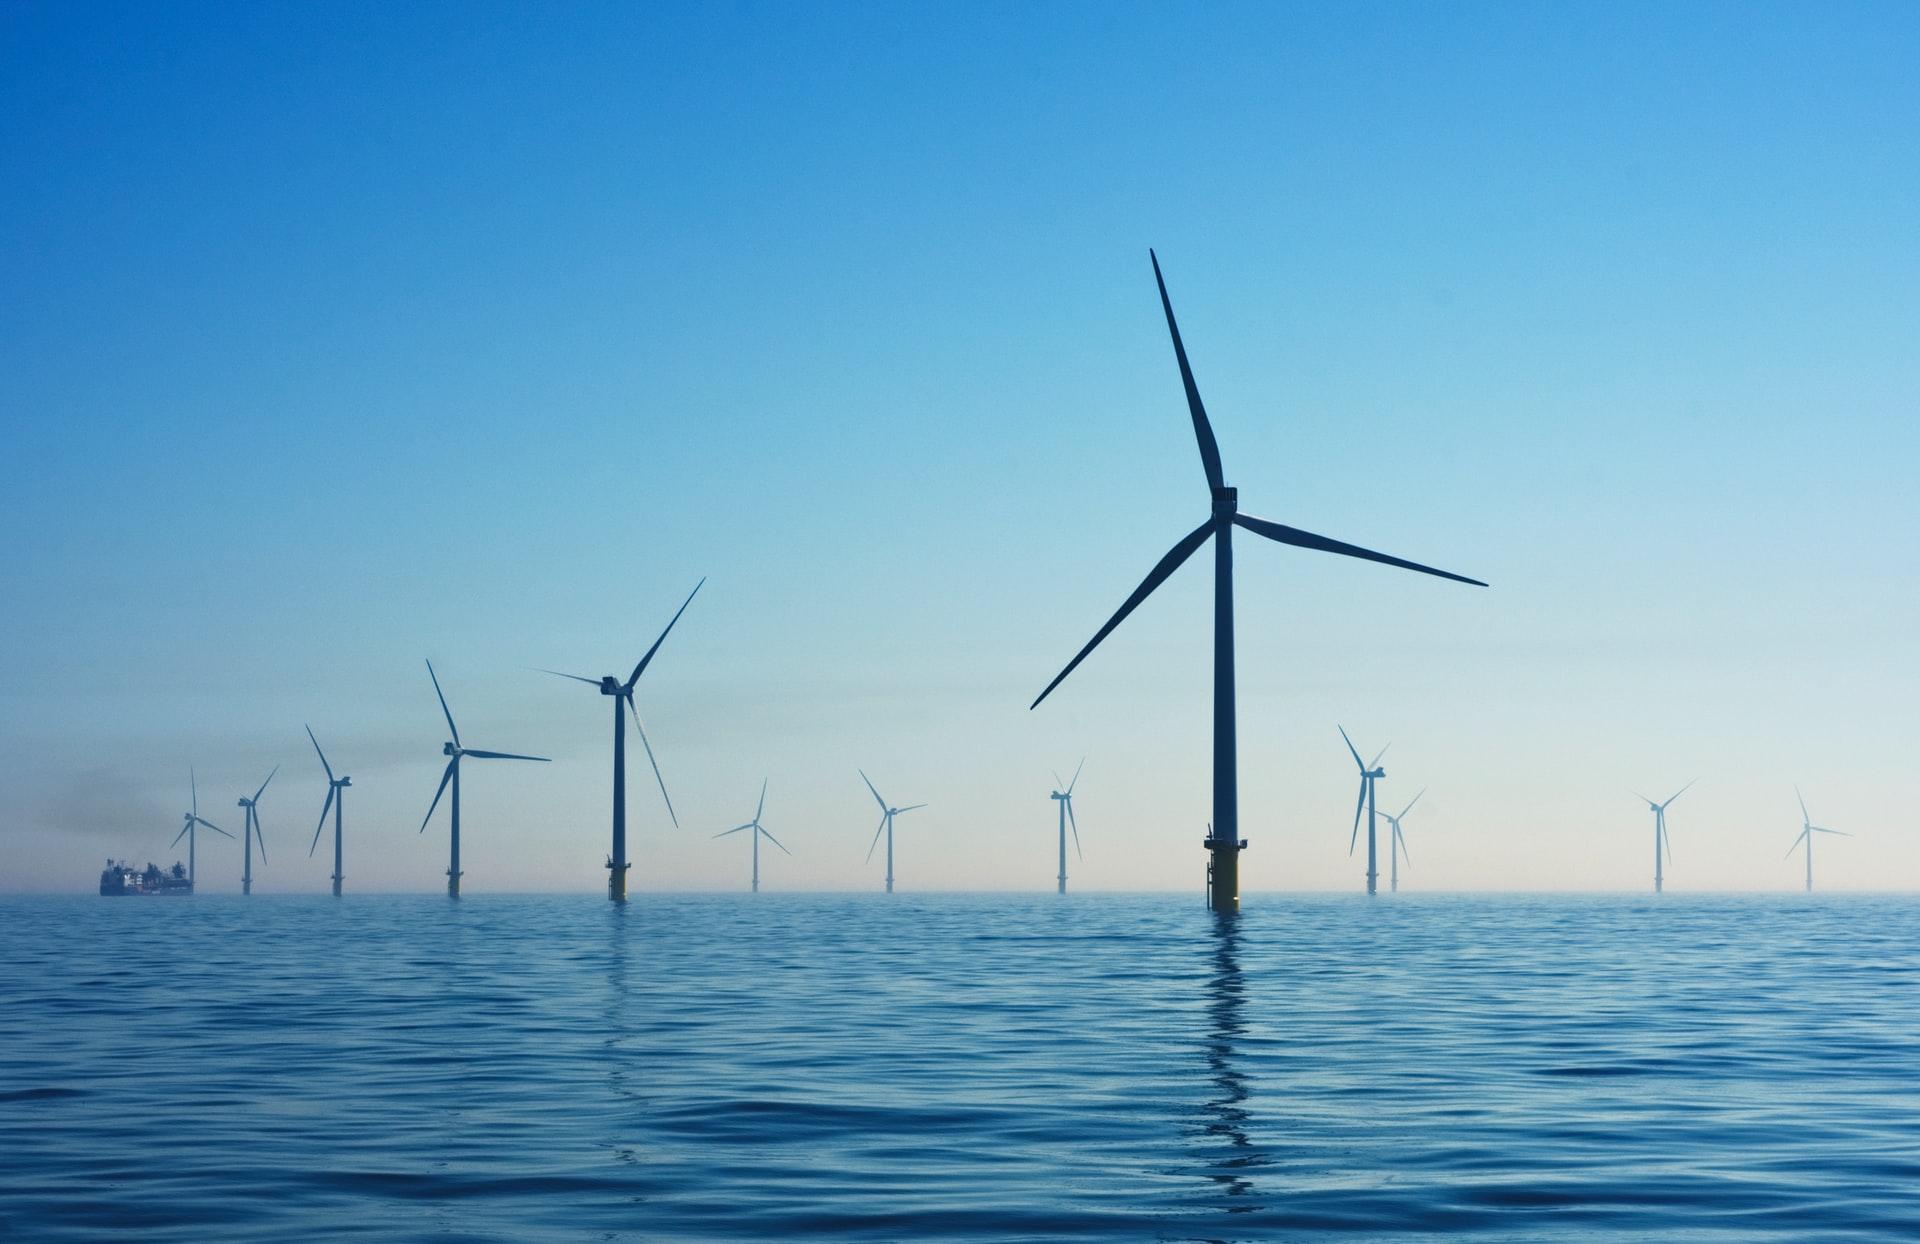 PKN Orlen selects strategic partner for offshore wind farm project